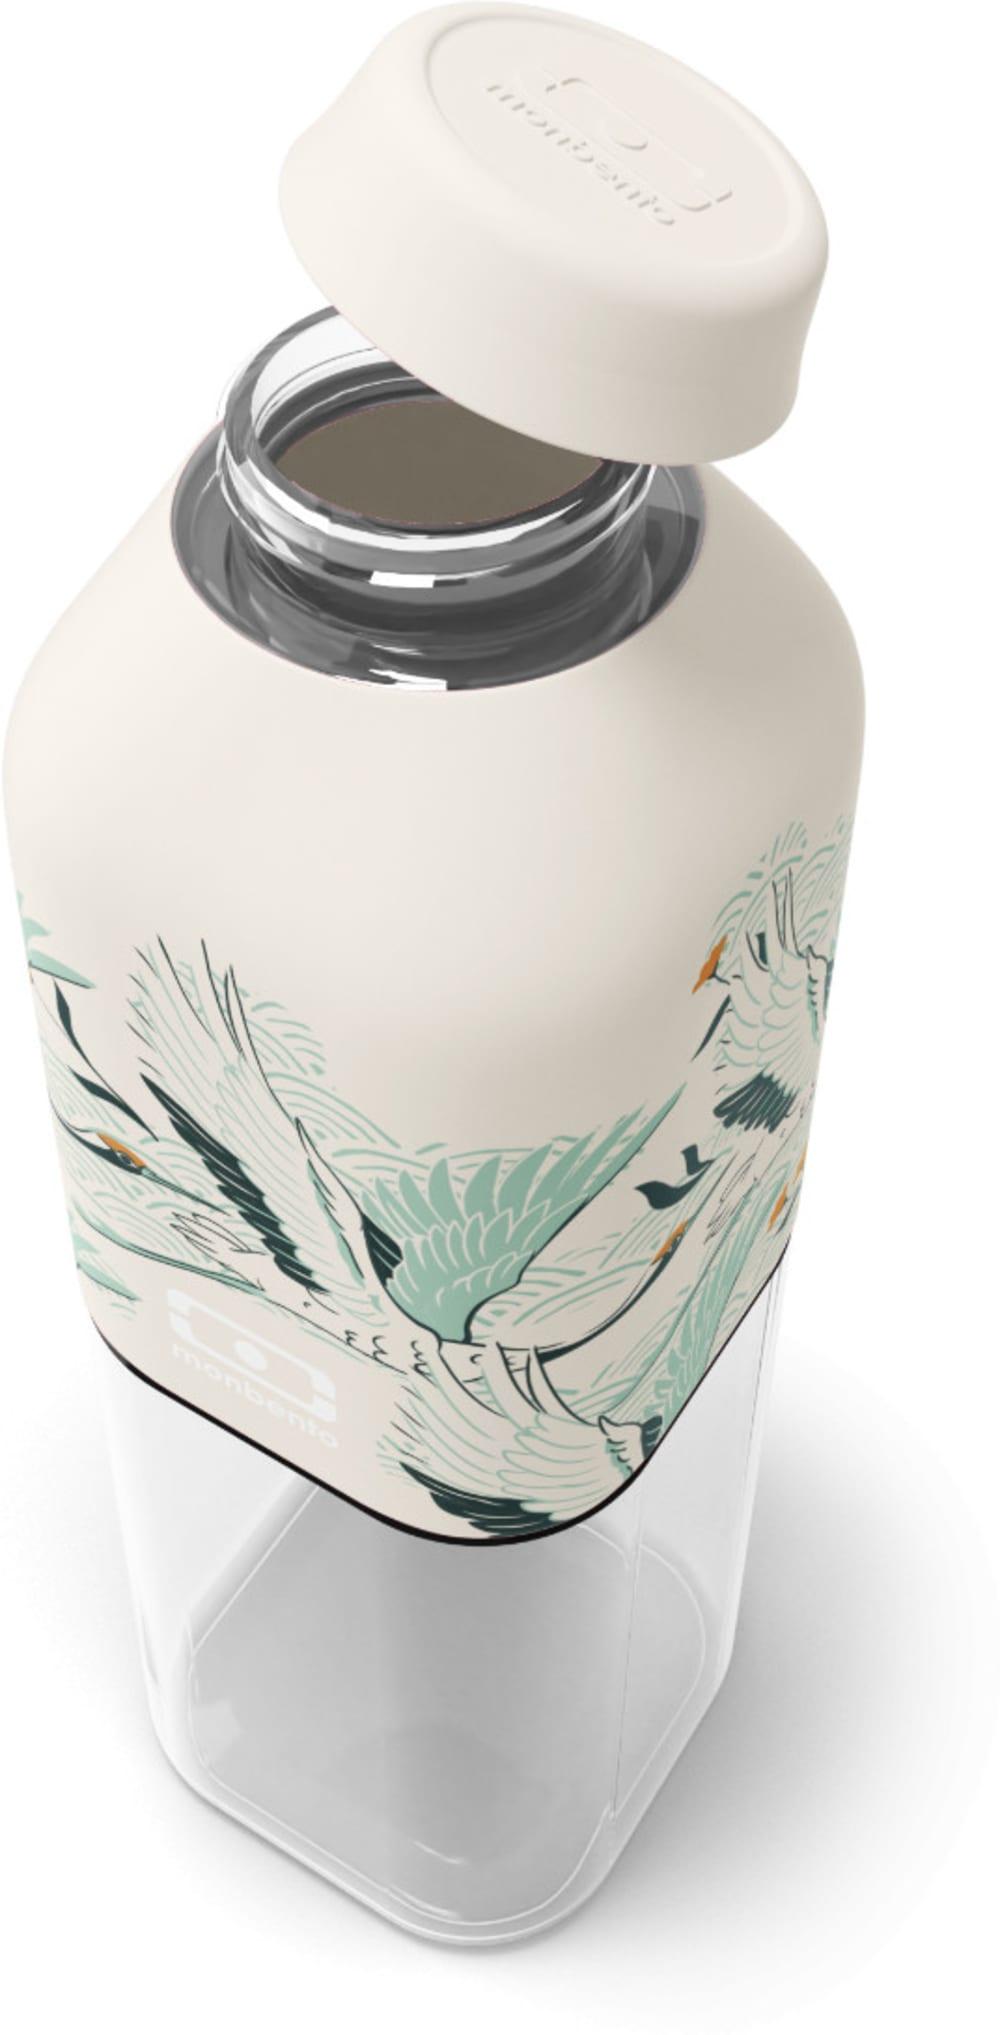 Butelka bidon na wodę, napoje MonBento 0,5l Graphic Destiny